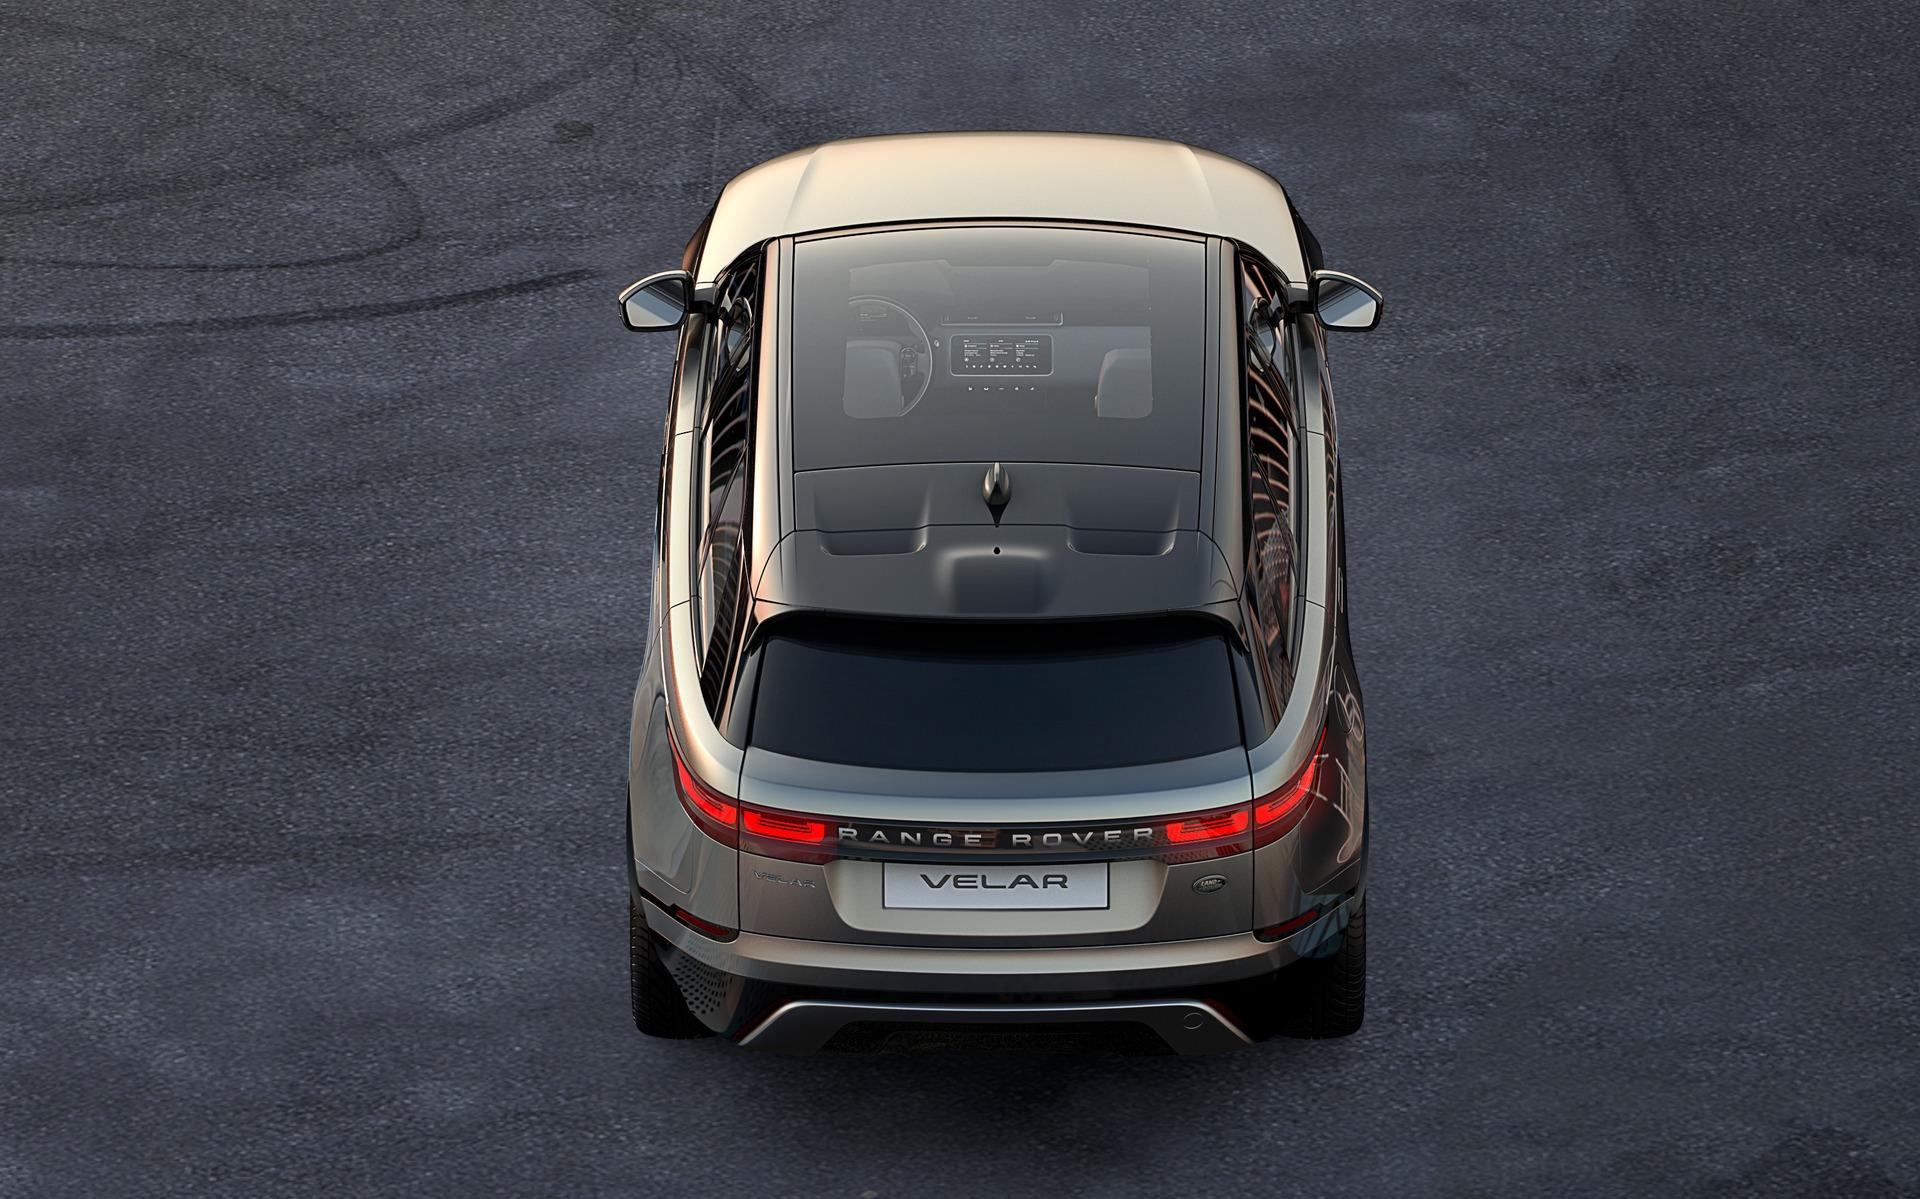 2018 Land Rover Range Rover Velar News reviews picture